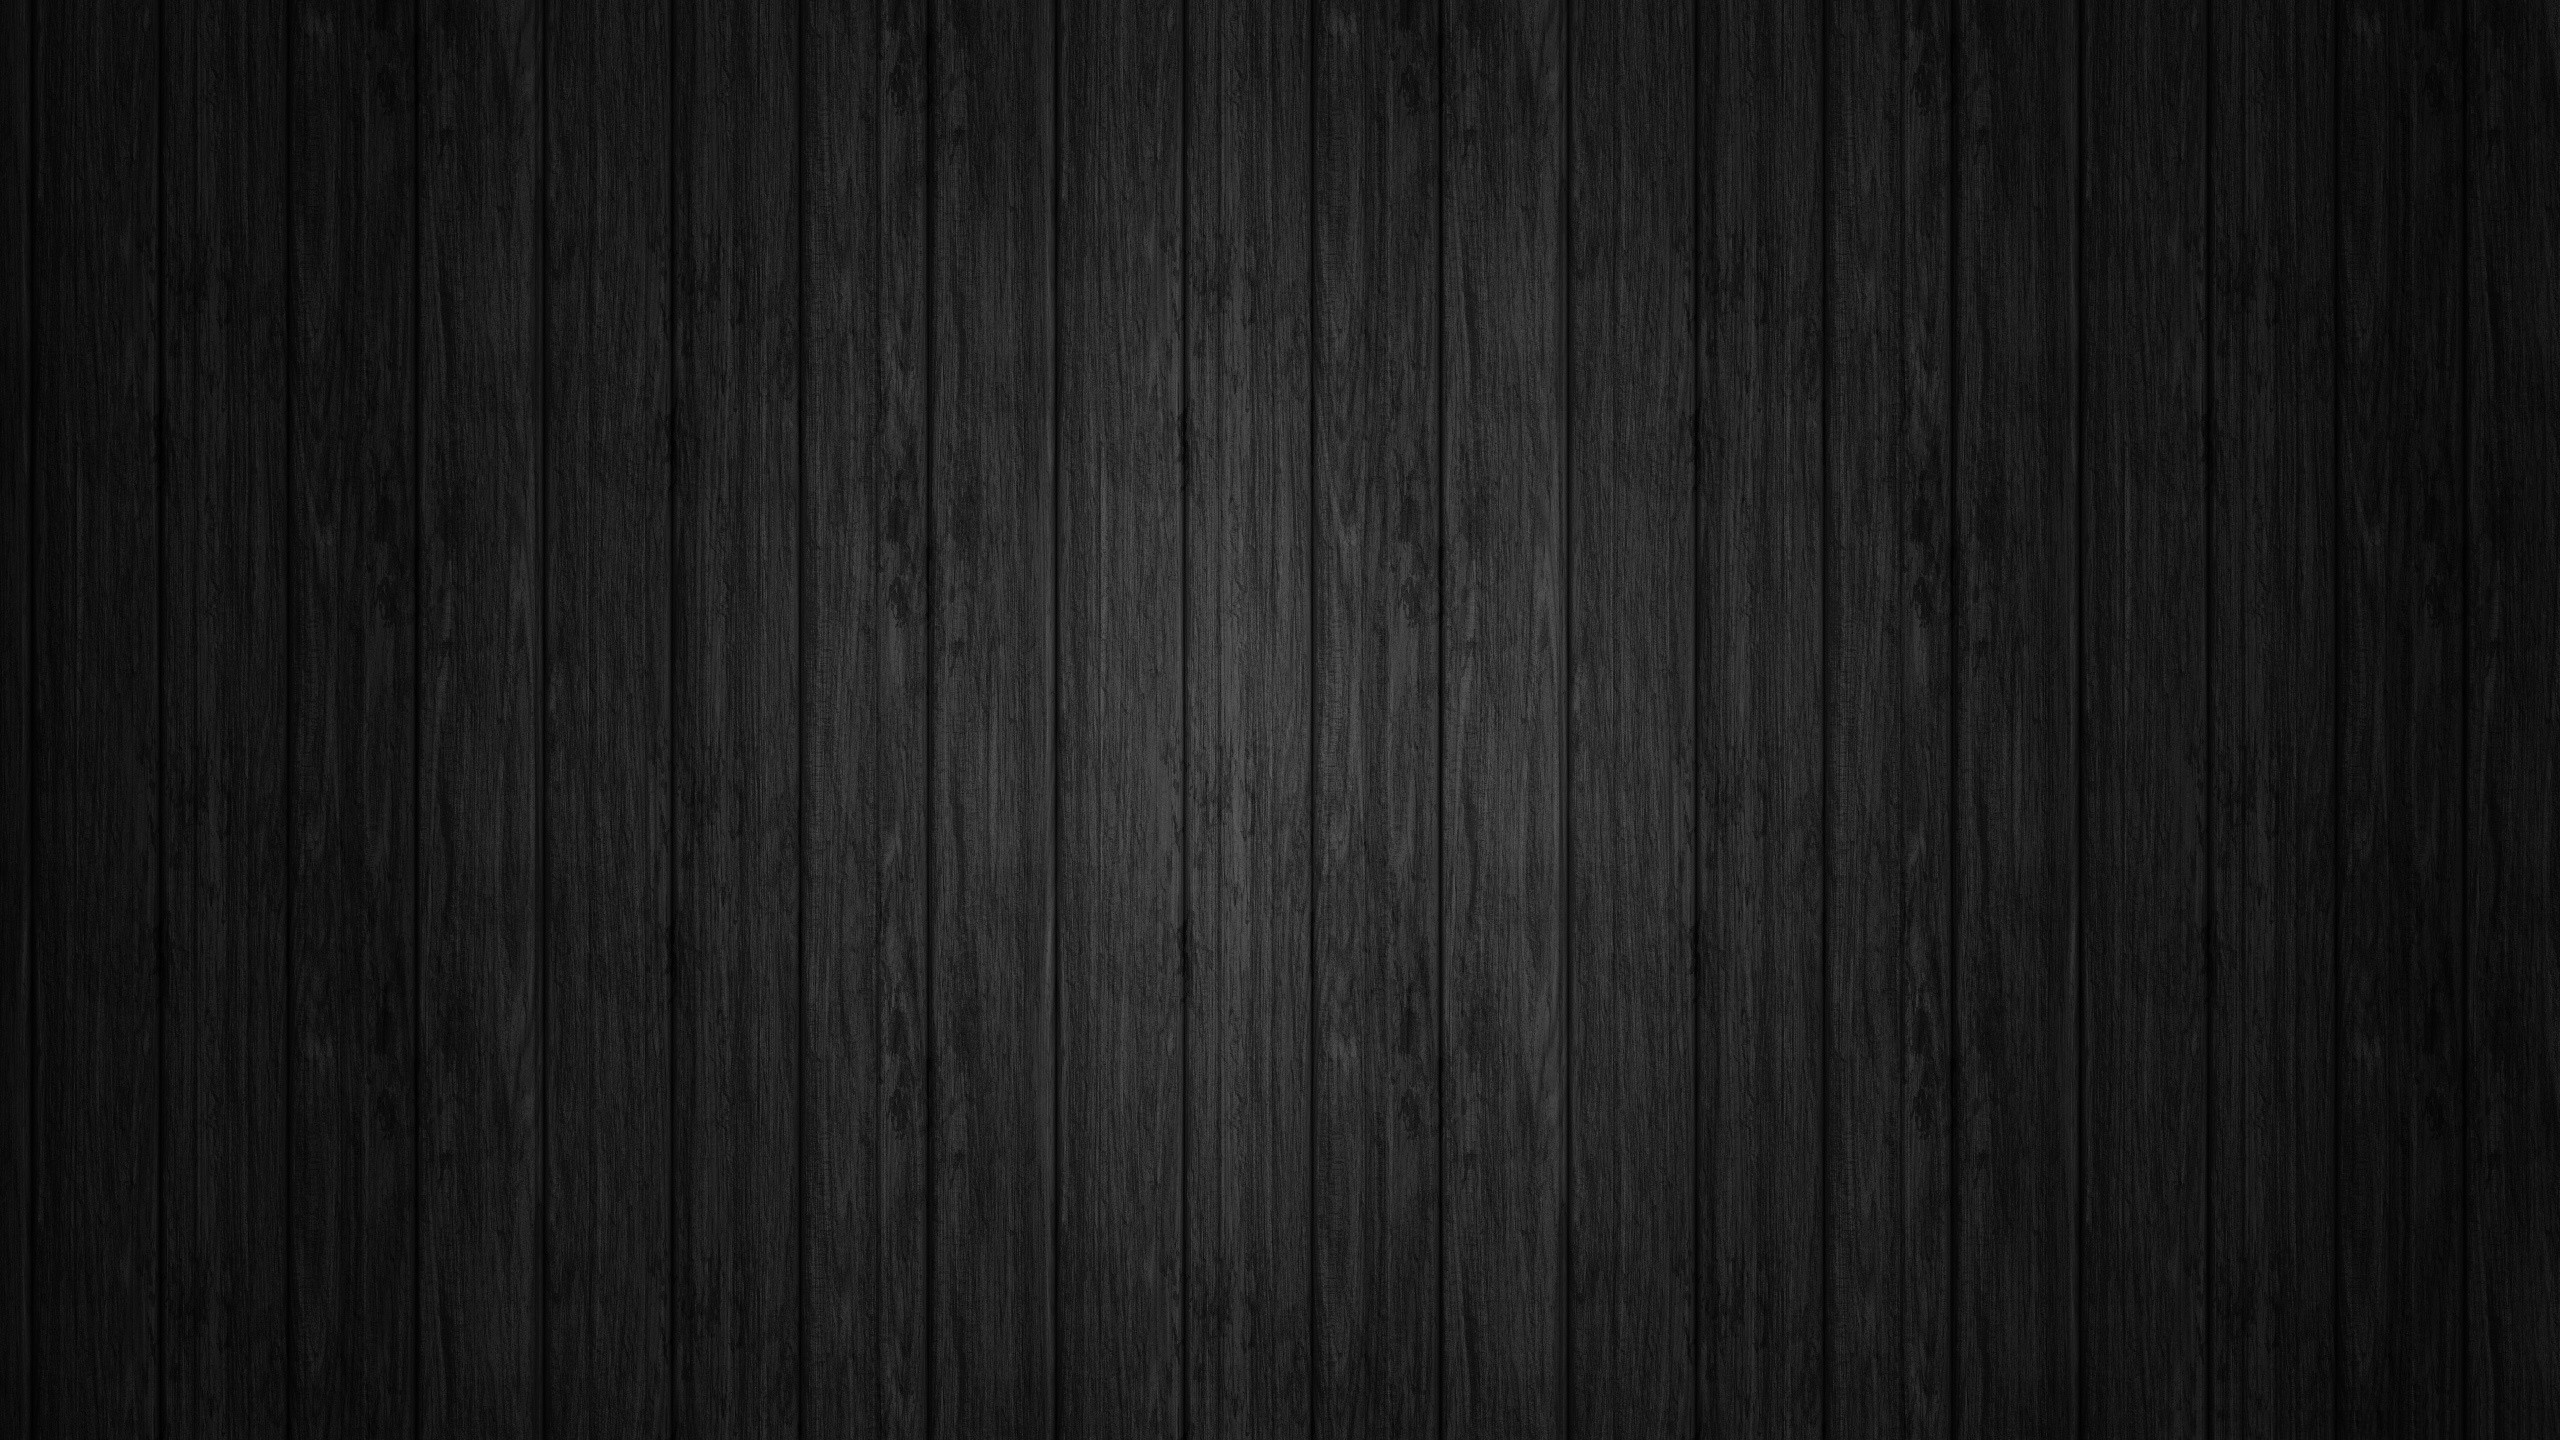 Dark Background Tumblr wallpaper #6138